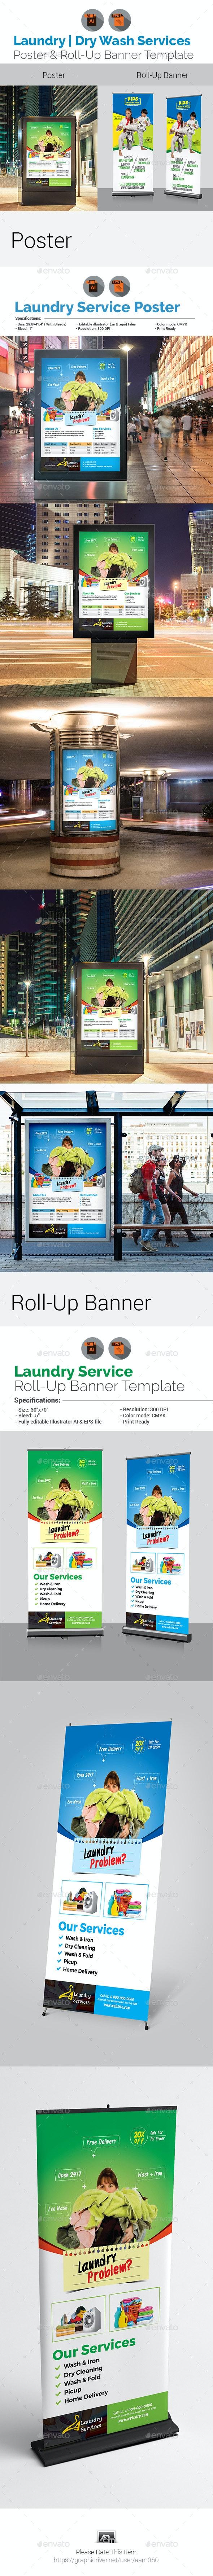 Laundry Services Signage Bundle - Signage Print Templates